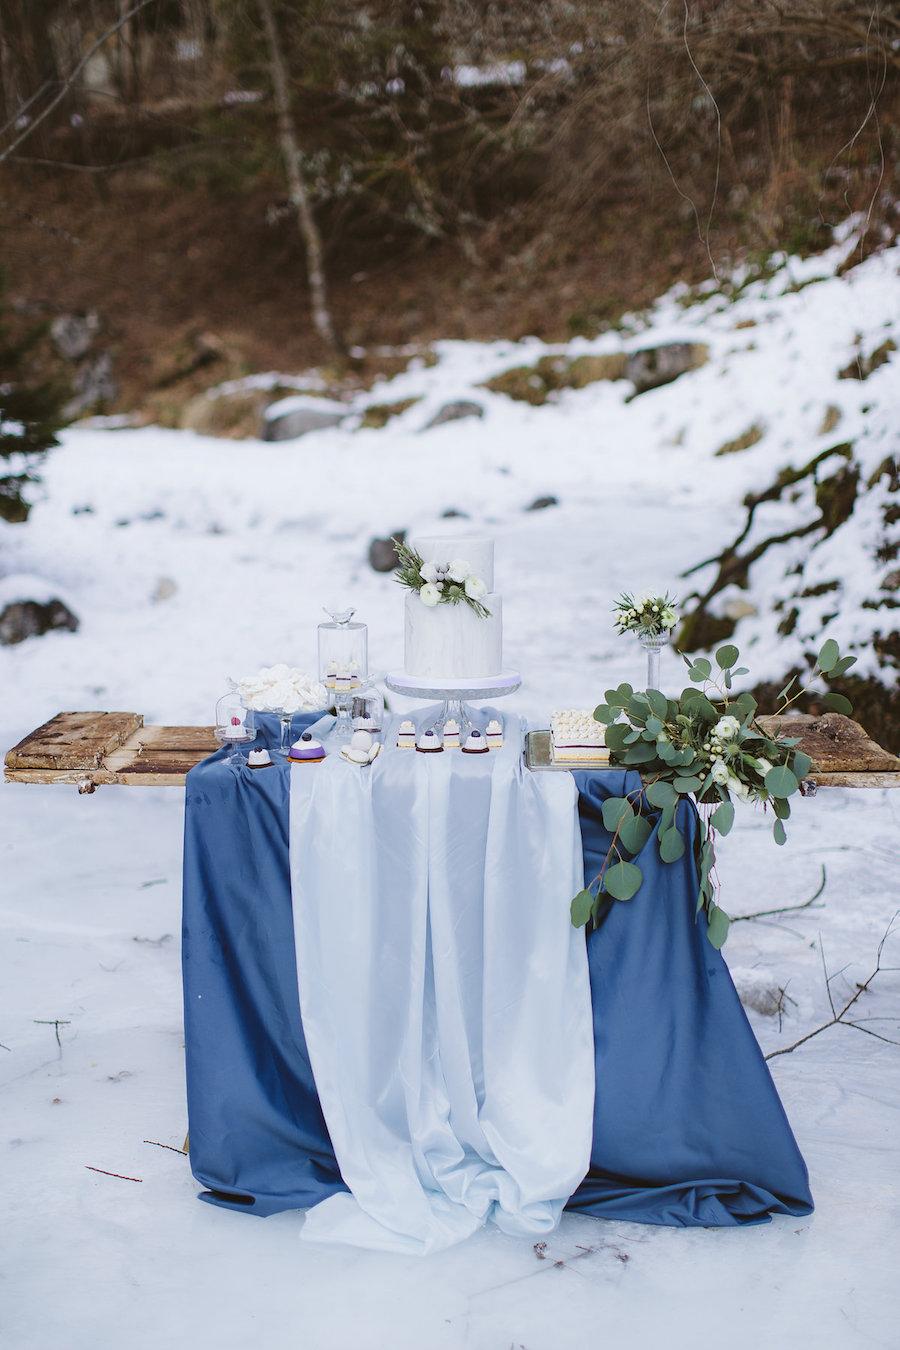 sweet table azzurro e blu invernale